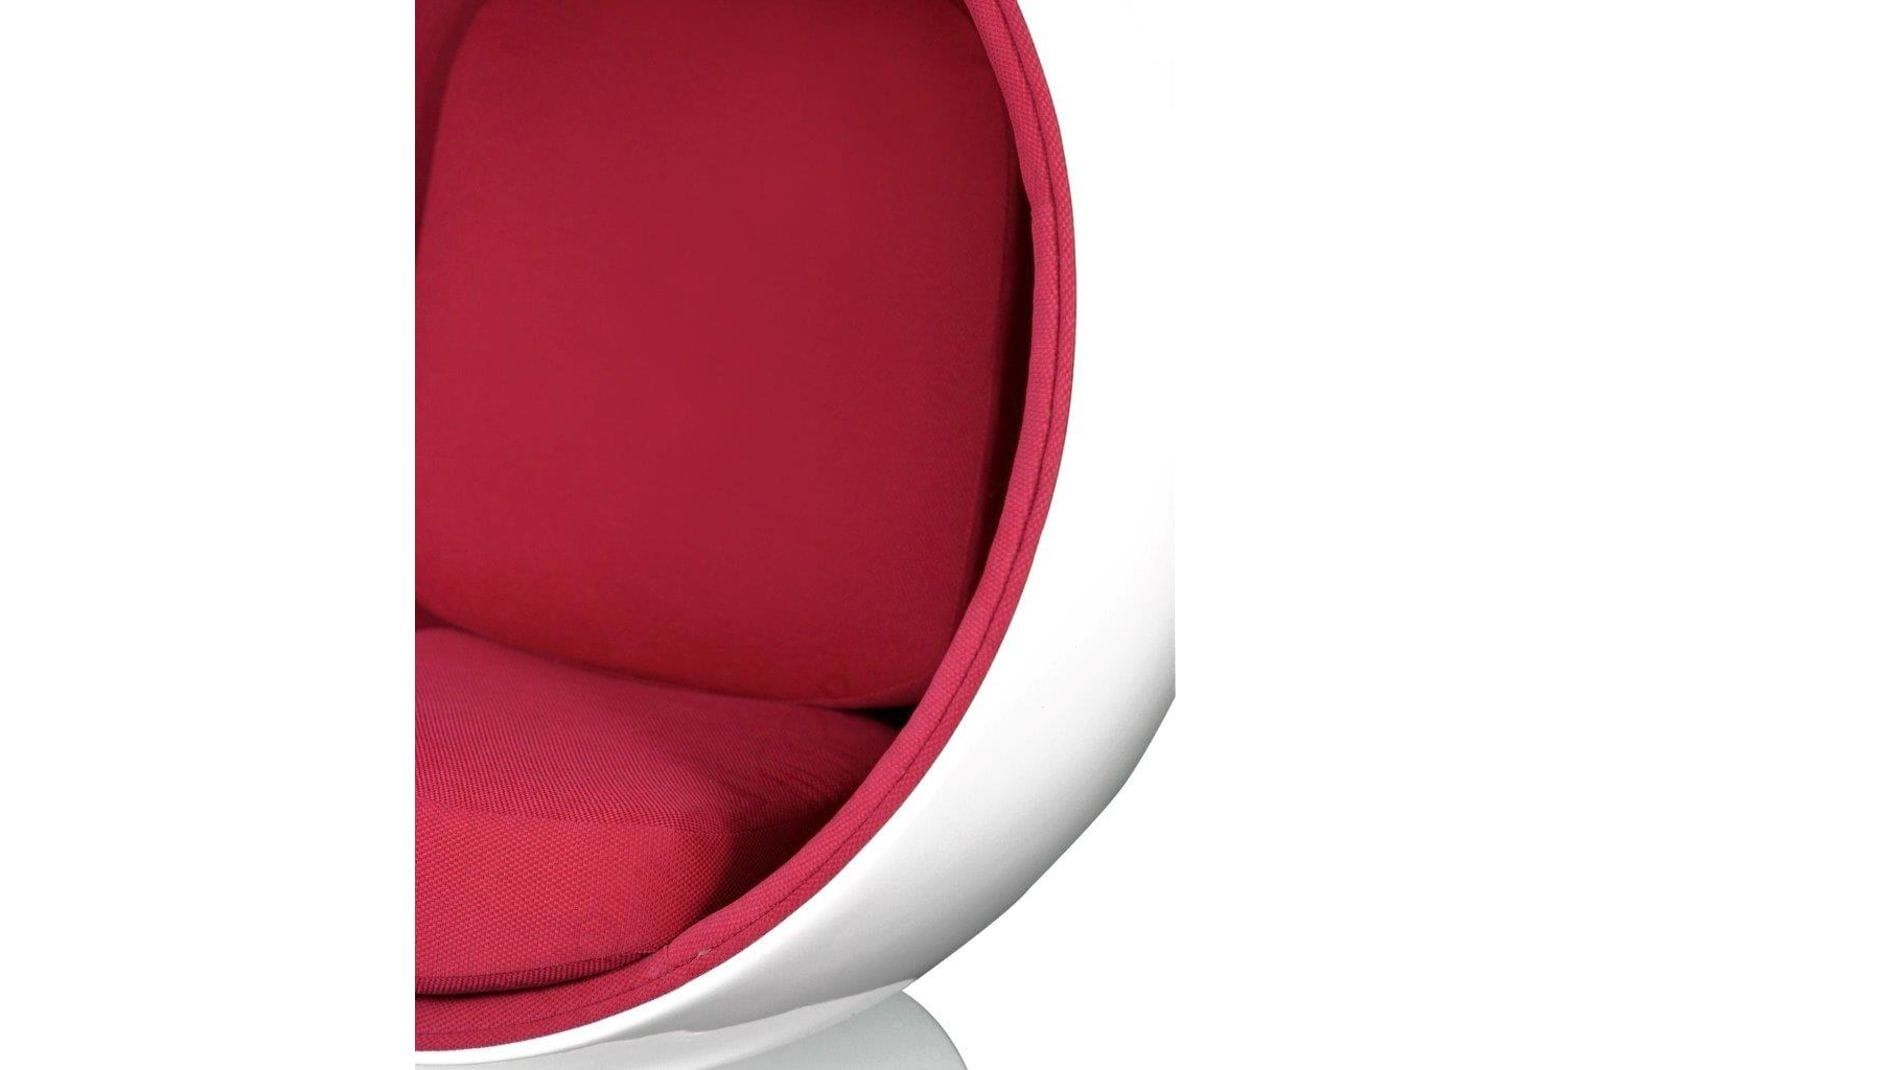 Кресло Eero Ball Chair Бело-красное Шерсть